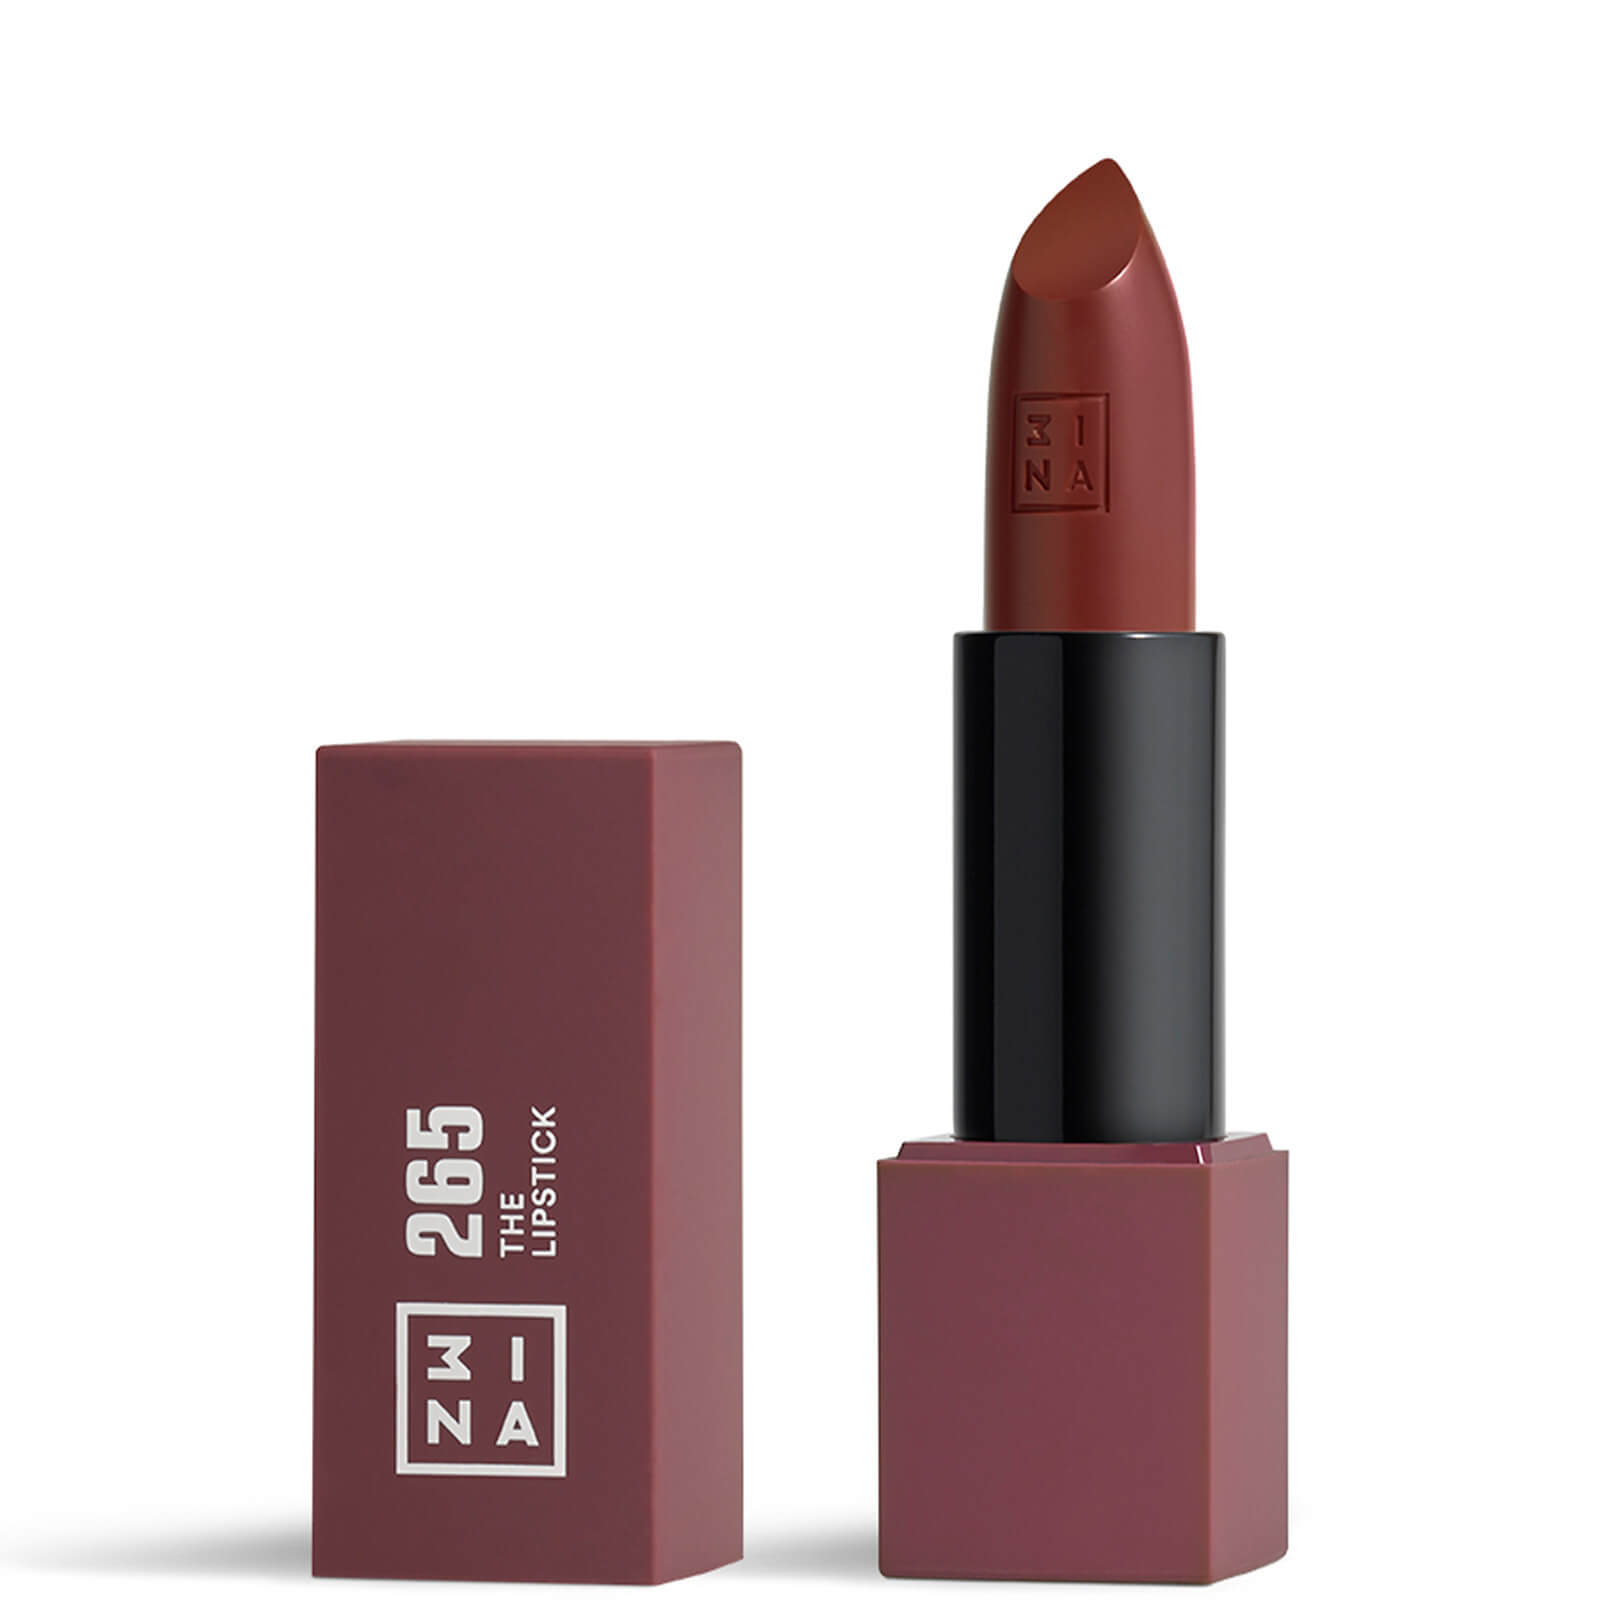 Купить 3INA Makeup The Lipstick 18g (Various Shades) - 265 Purplish Brown